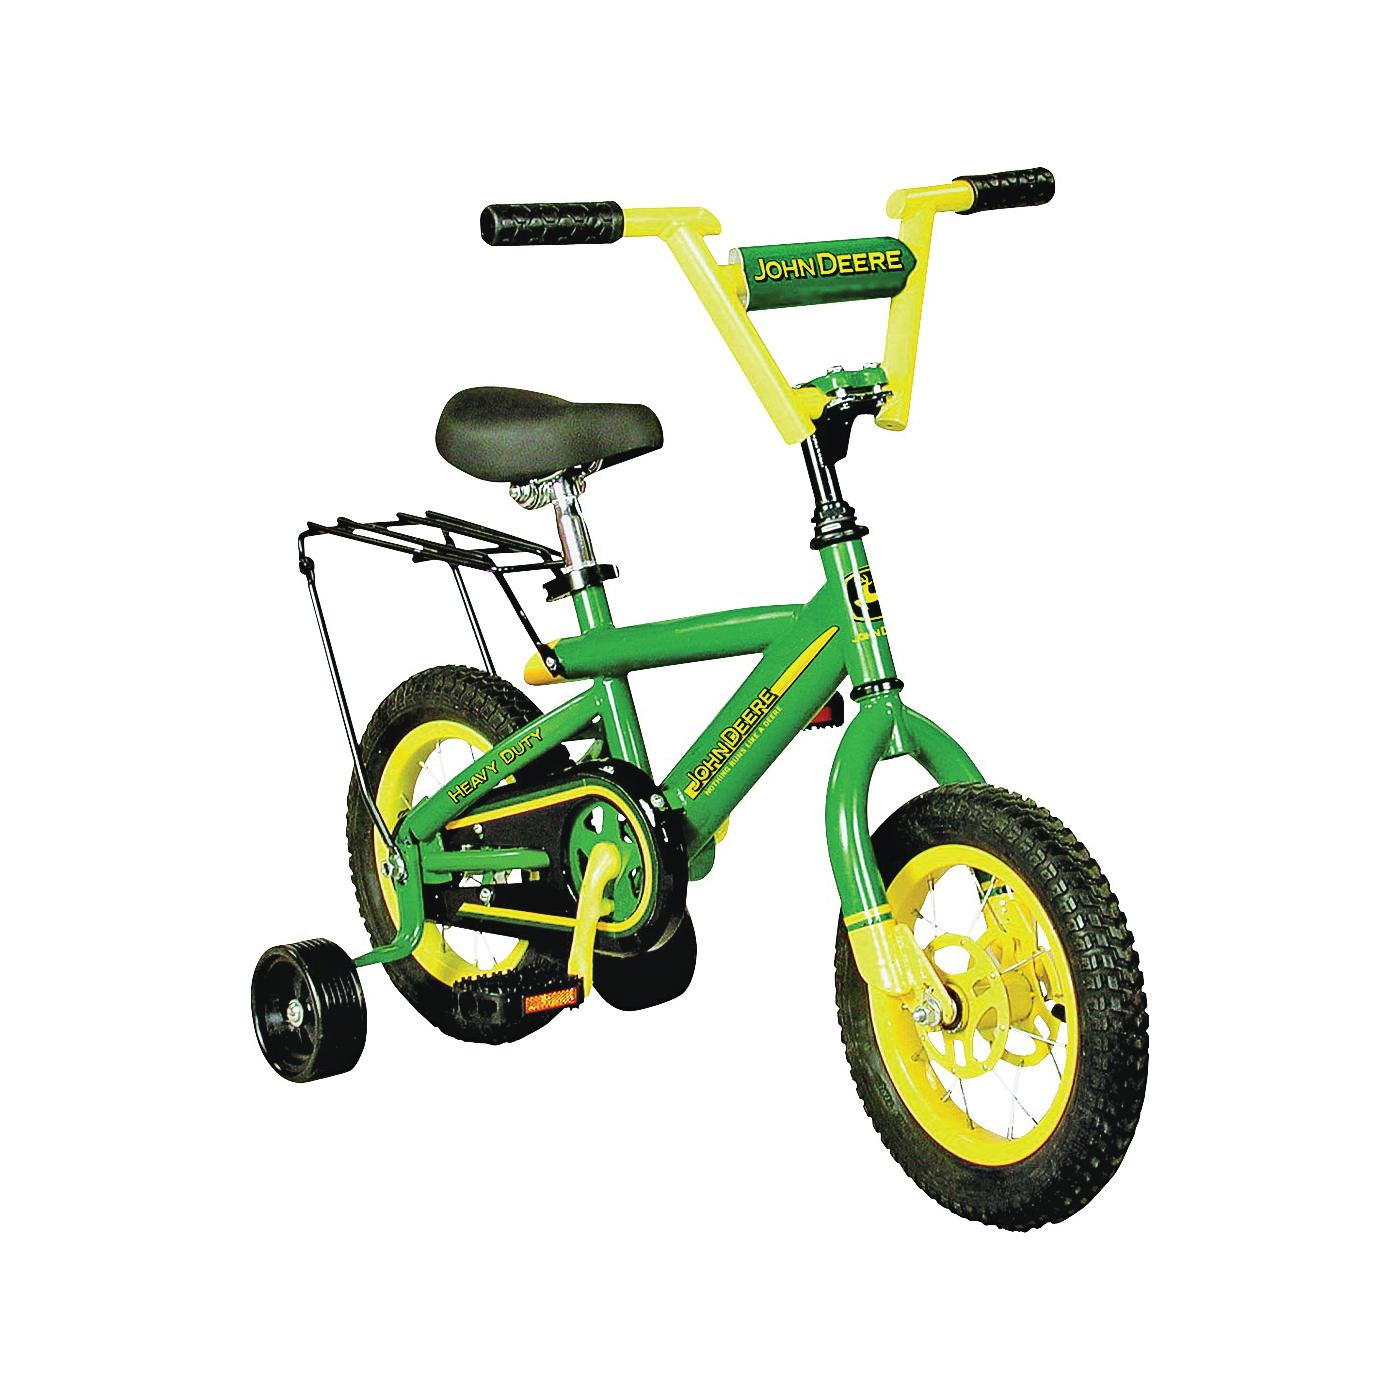 Picture of John Deere Toys 34938 Bicycle, > 3 years, Steel Frame, 12 in Dia Wheel, Green